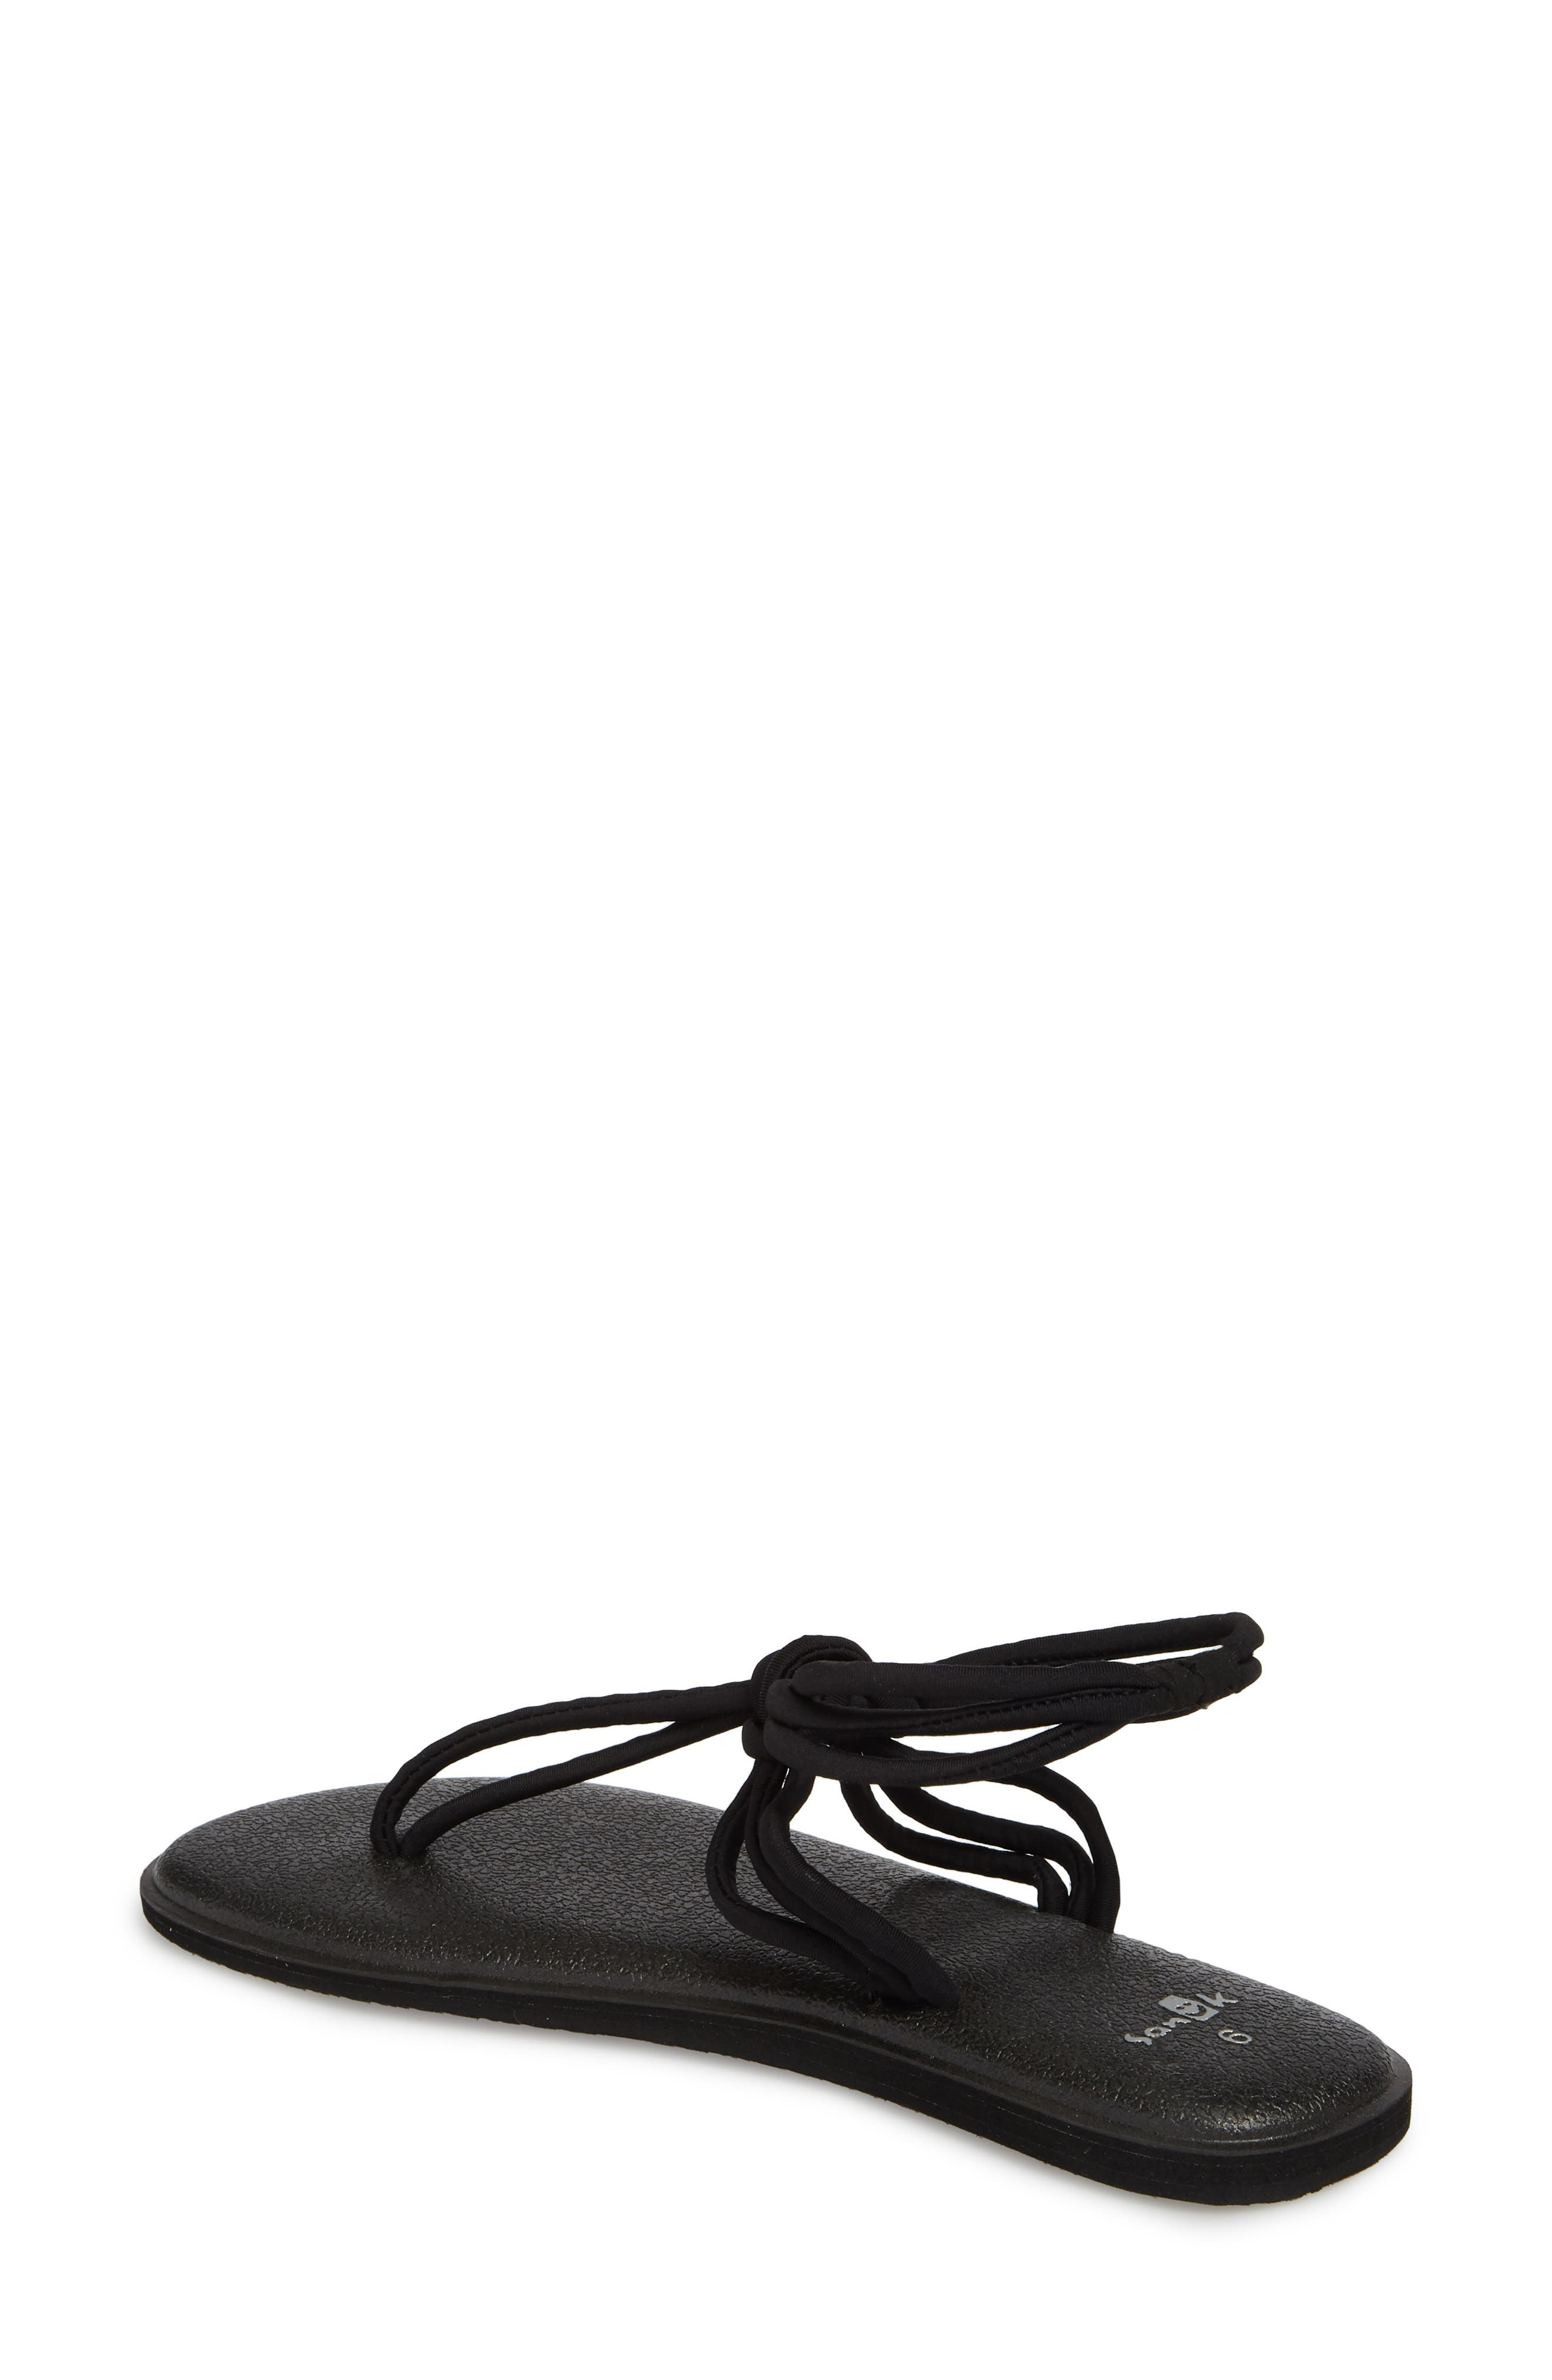 flip mat s flop sanuk yoga snuk sandals womens mats fashion women